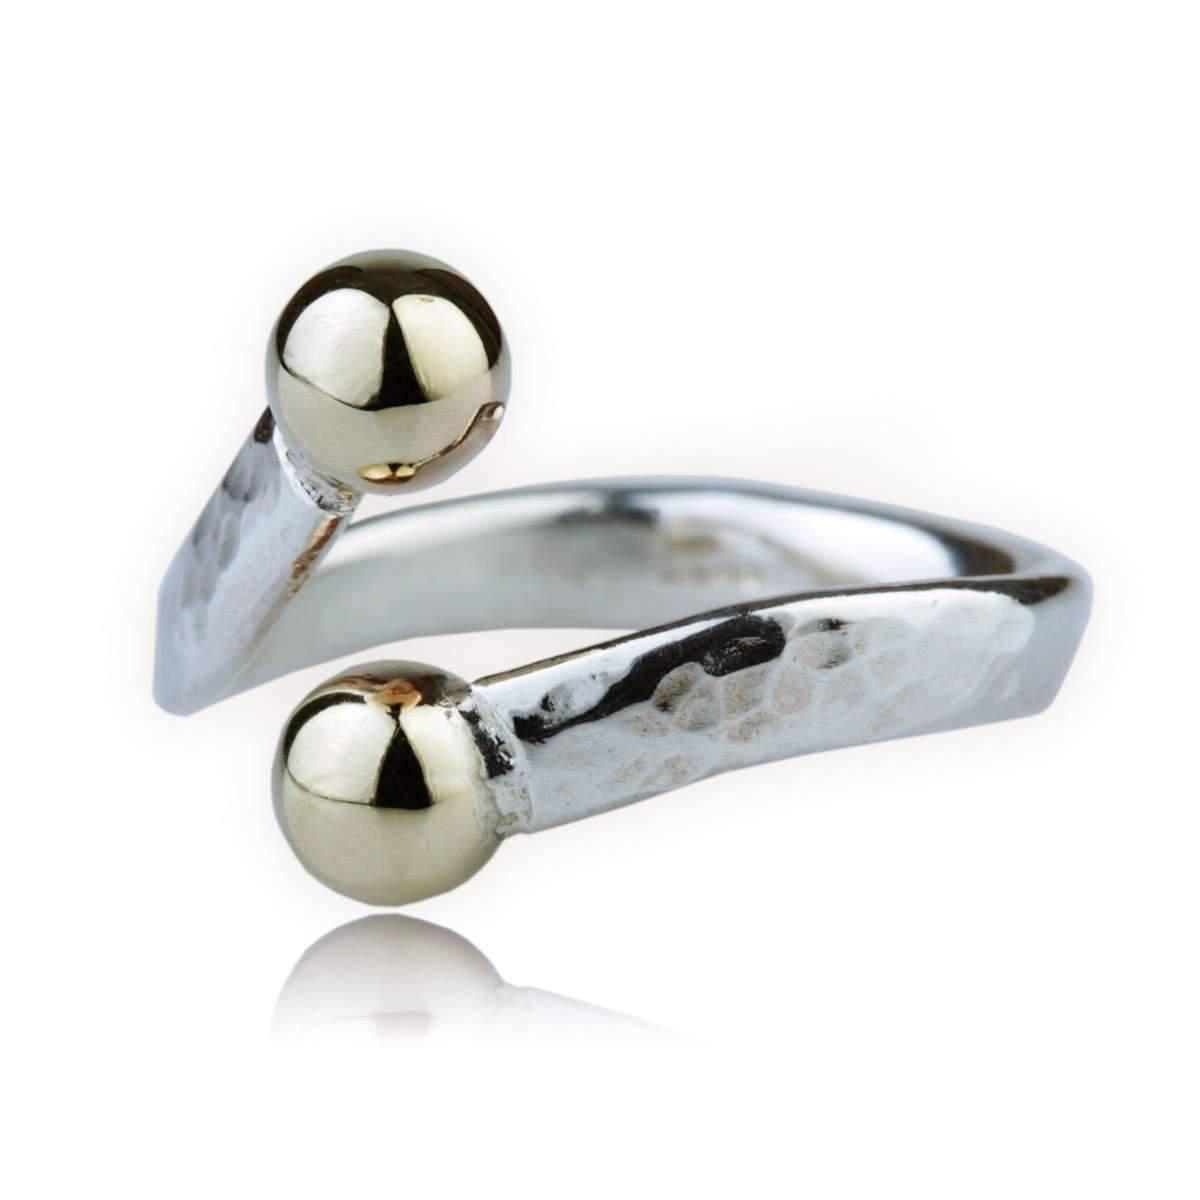 Lavan 9kt Gold & Sterling Silver Flower Ring - UK K 1/2 - US 5 3/8 - EU 50 3/4 uqLPvq8KT